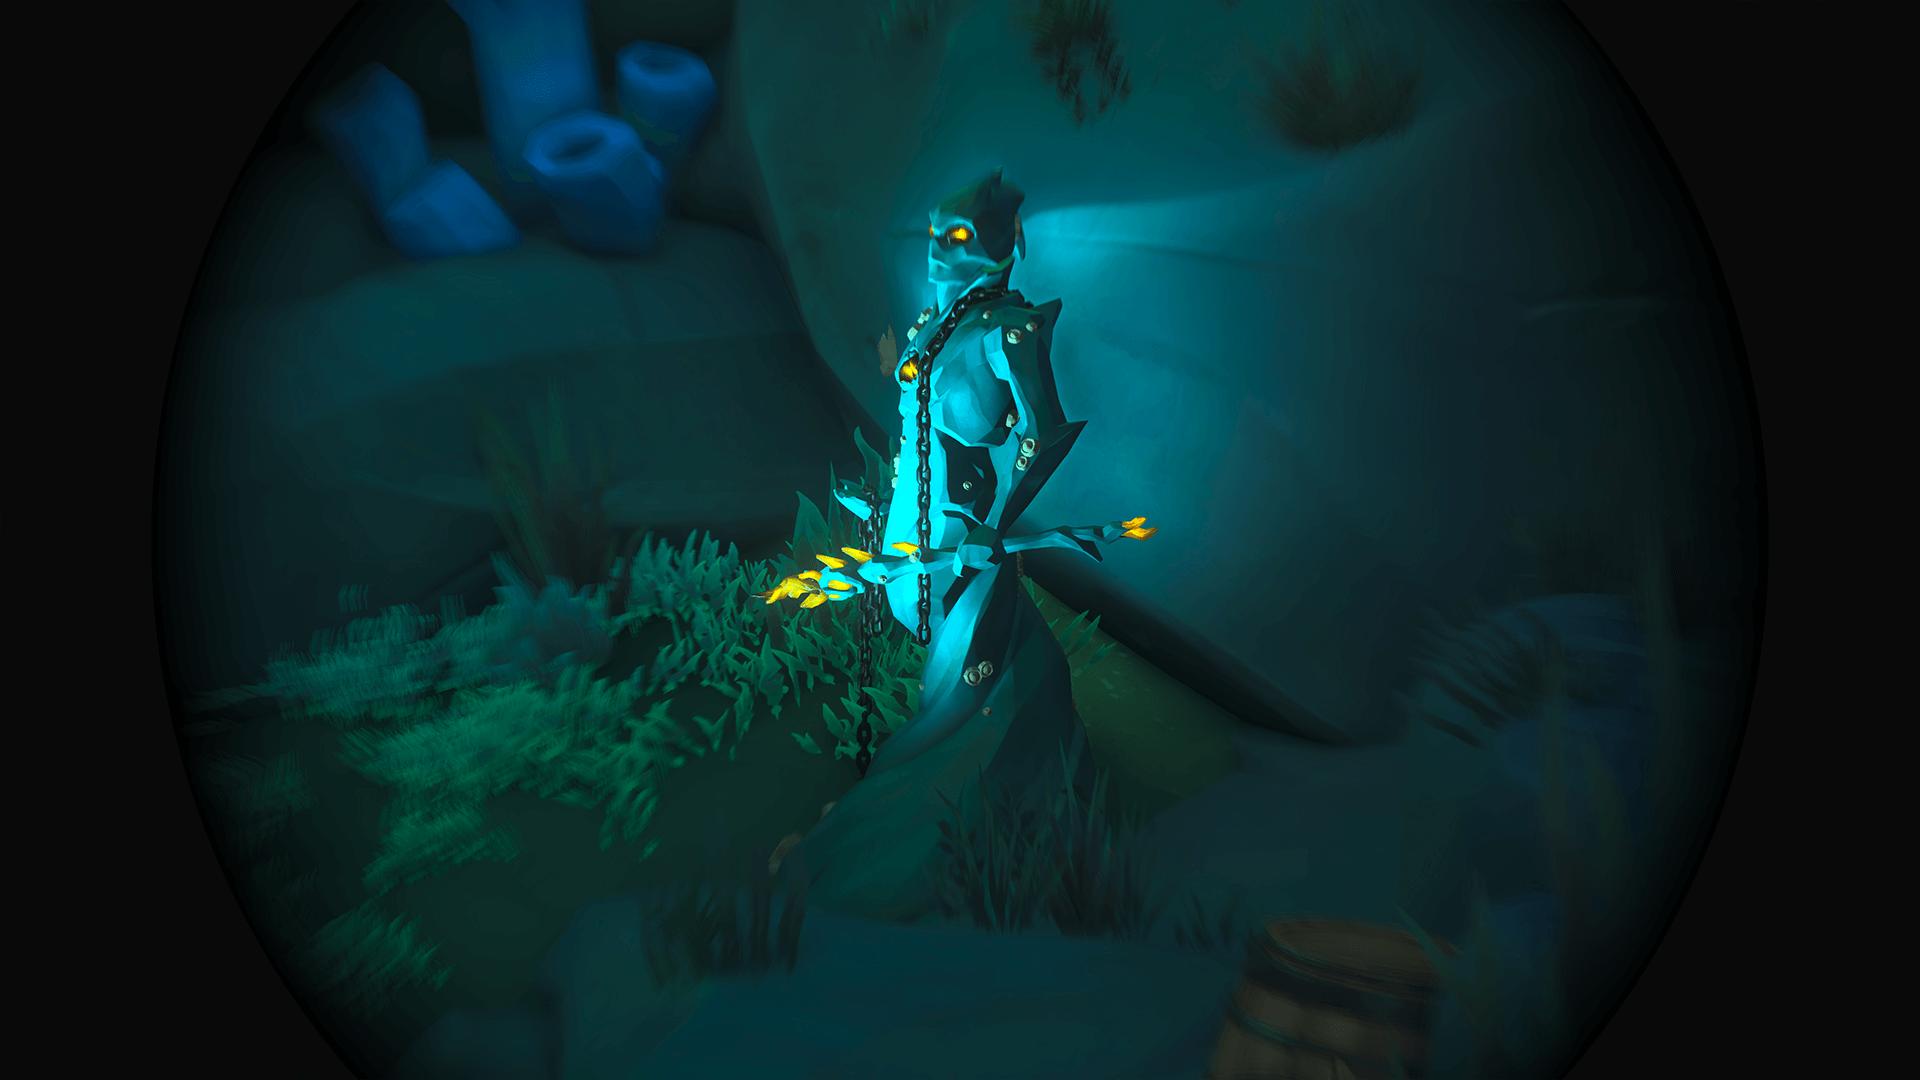 Citadel-Cavern 3-Chain Statue Low